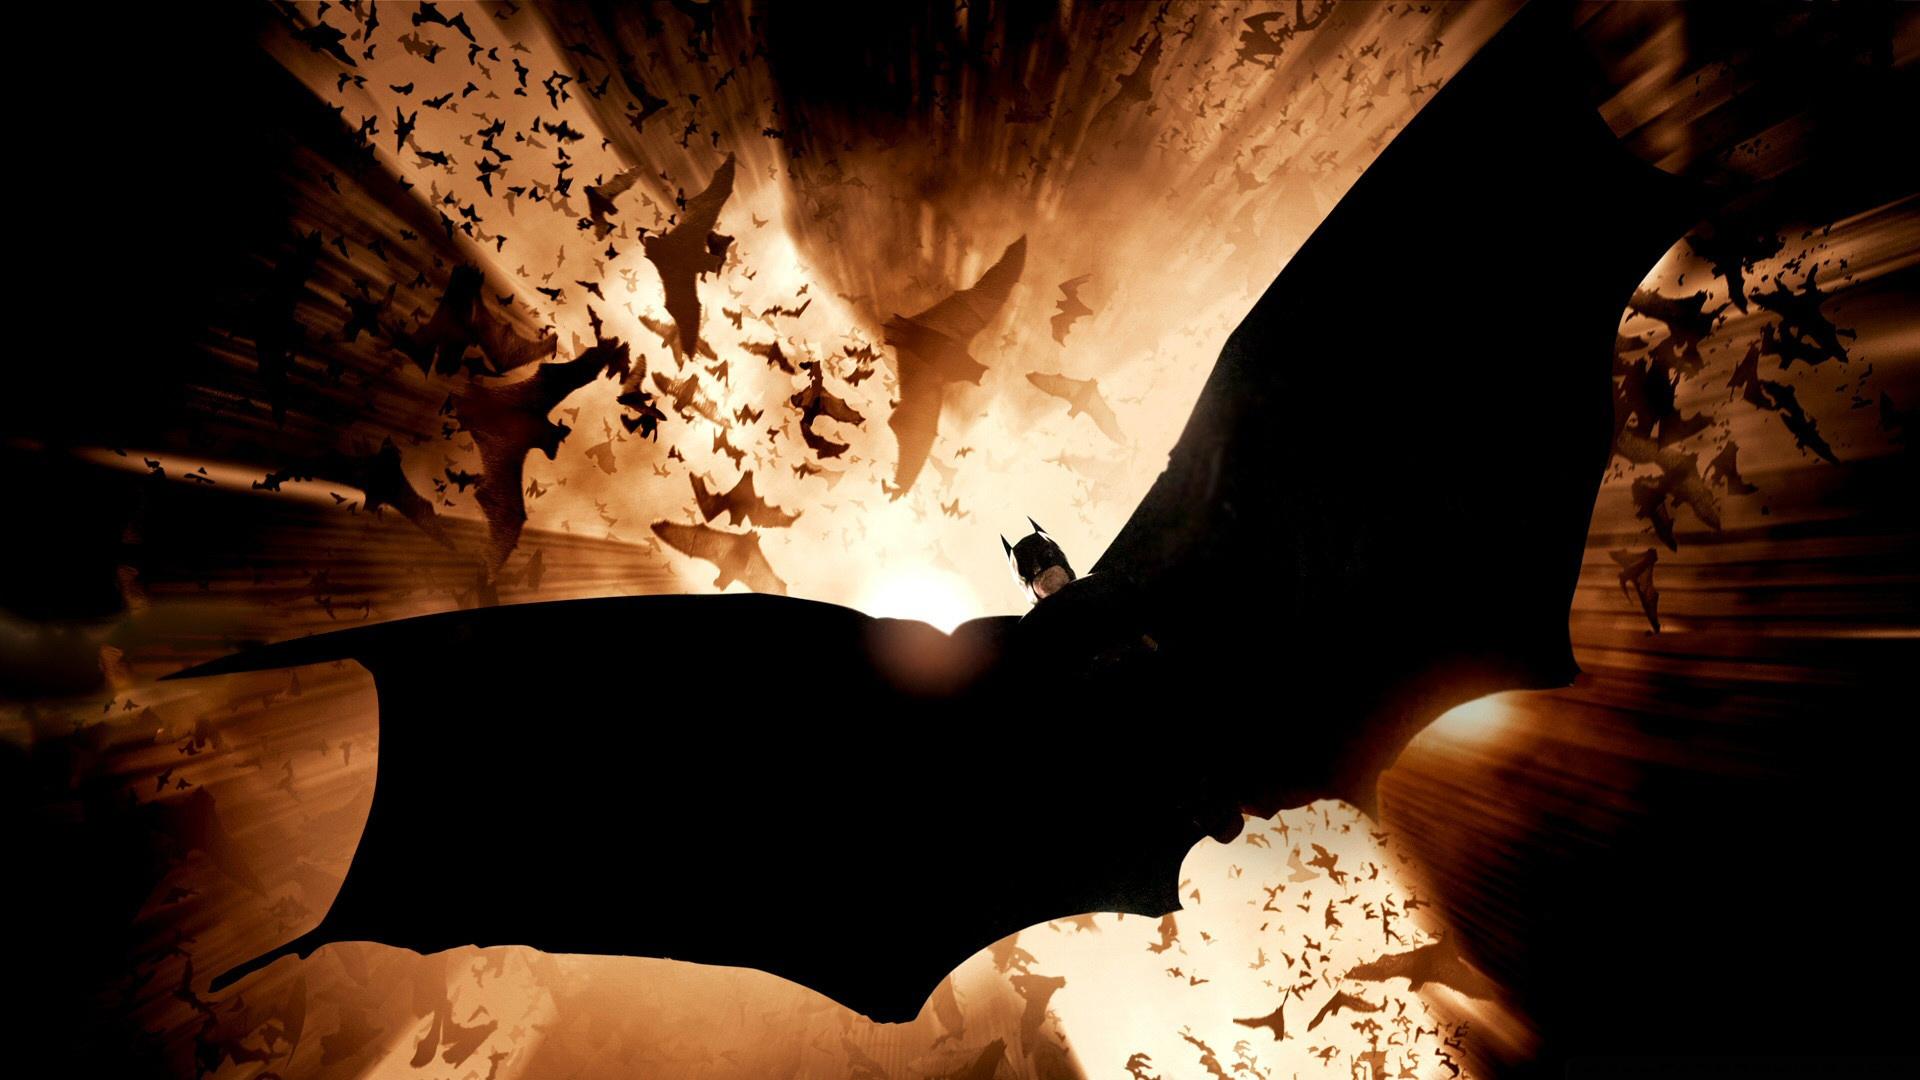 2012 Batman Movie Wallpapers HD Wallpapers 1920x1080